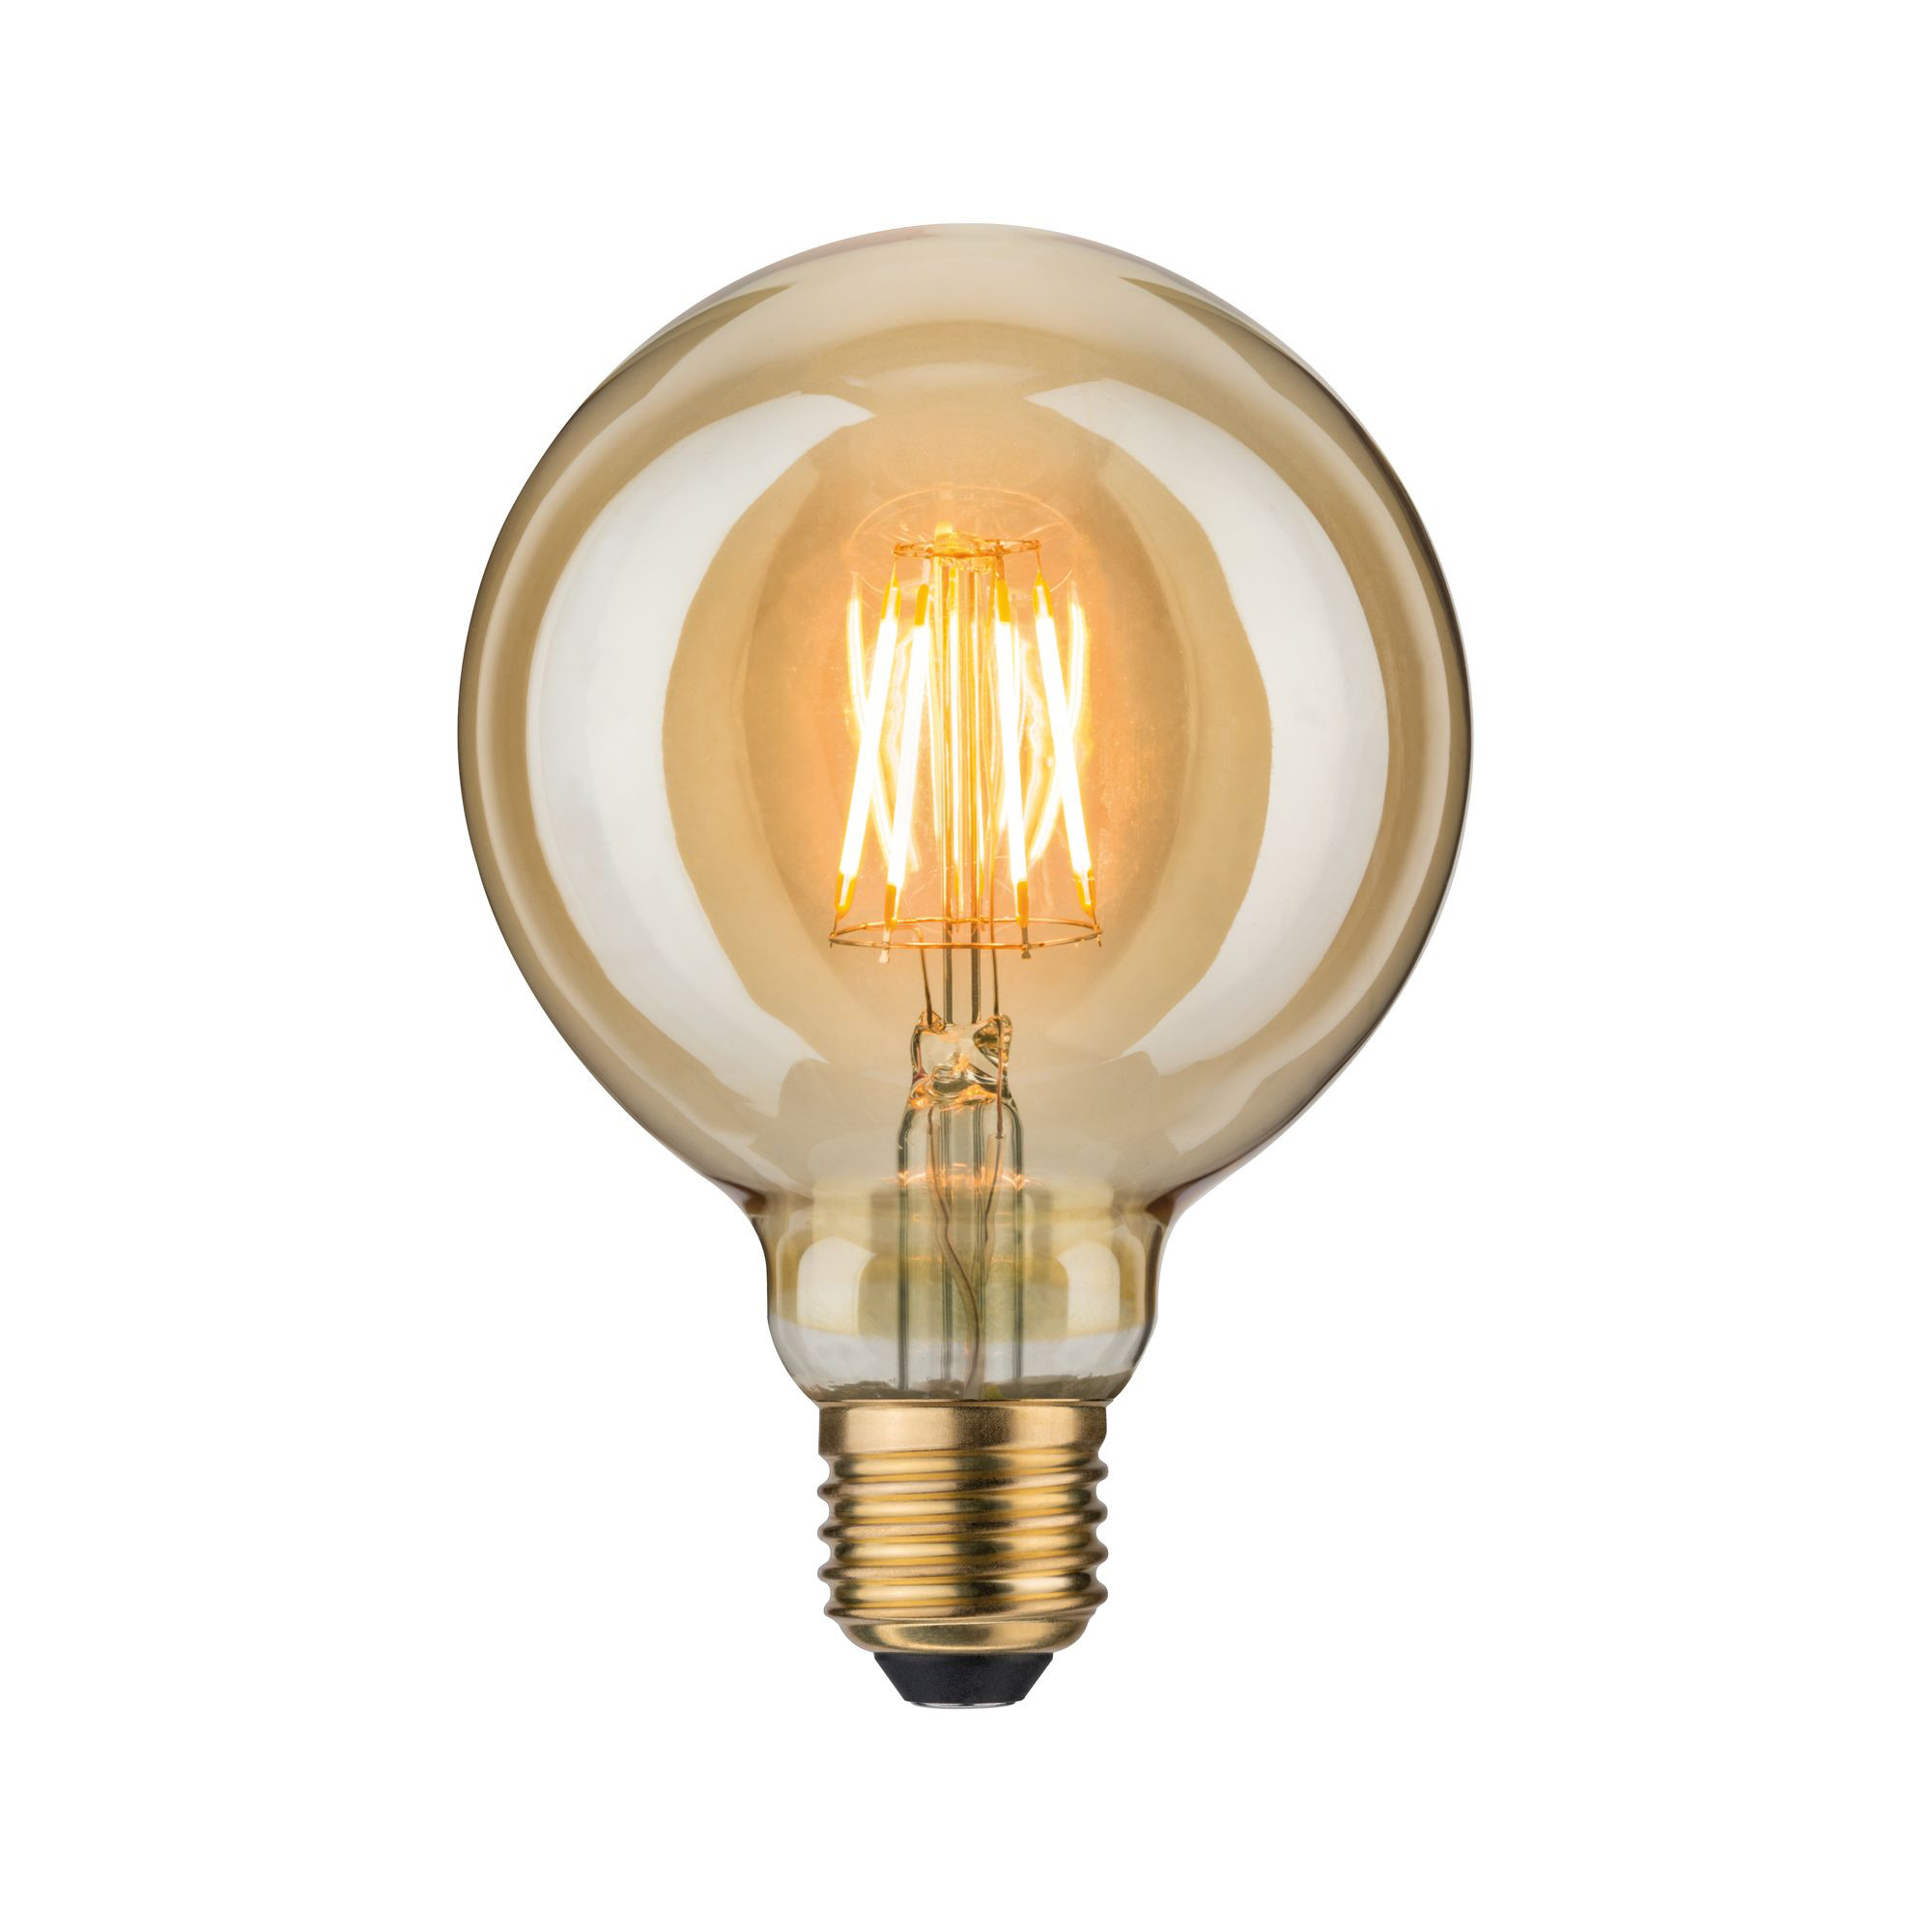 Лампа филаментная Paulmann Шар G95 6.5Вт 400лм 1700К Е27 230В Золото 28389.